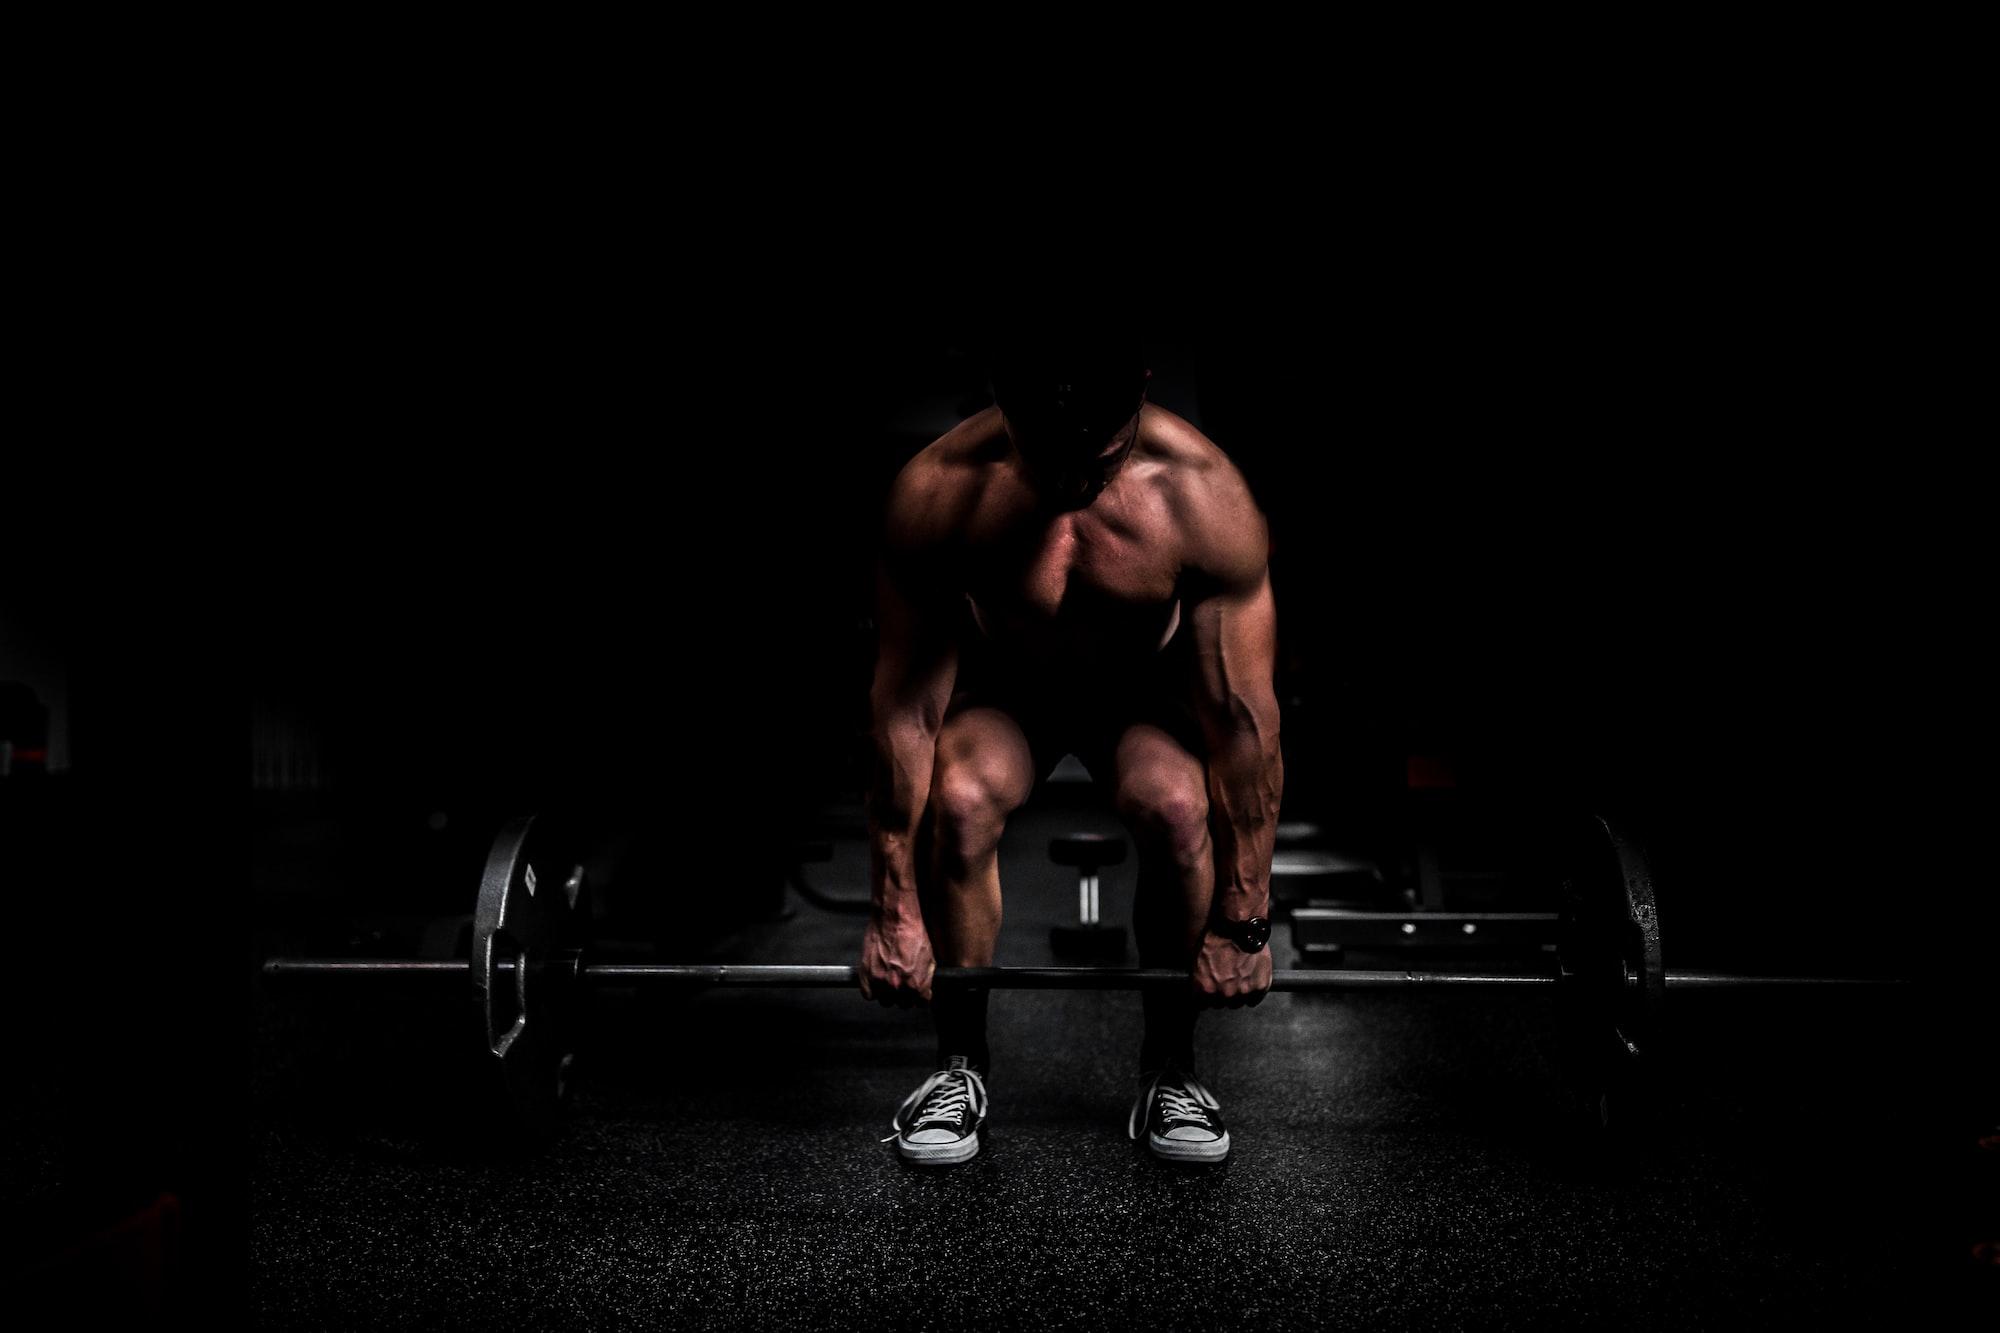 Professional bodybuilder posing  Captured By @VisualsByRoyalZ